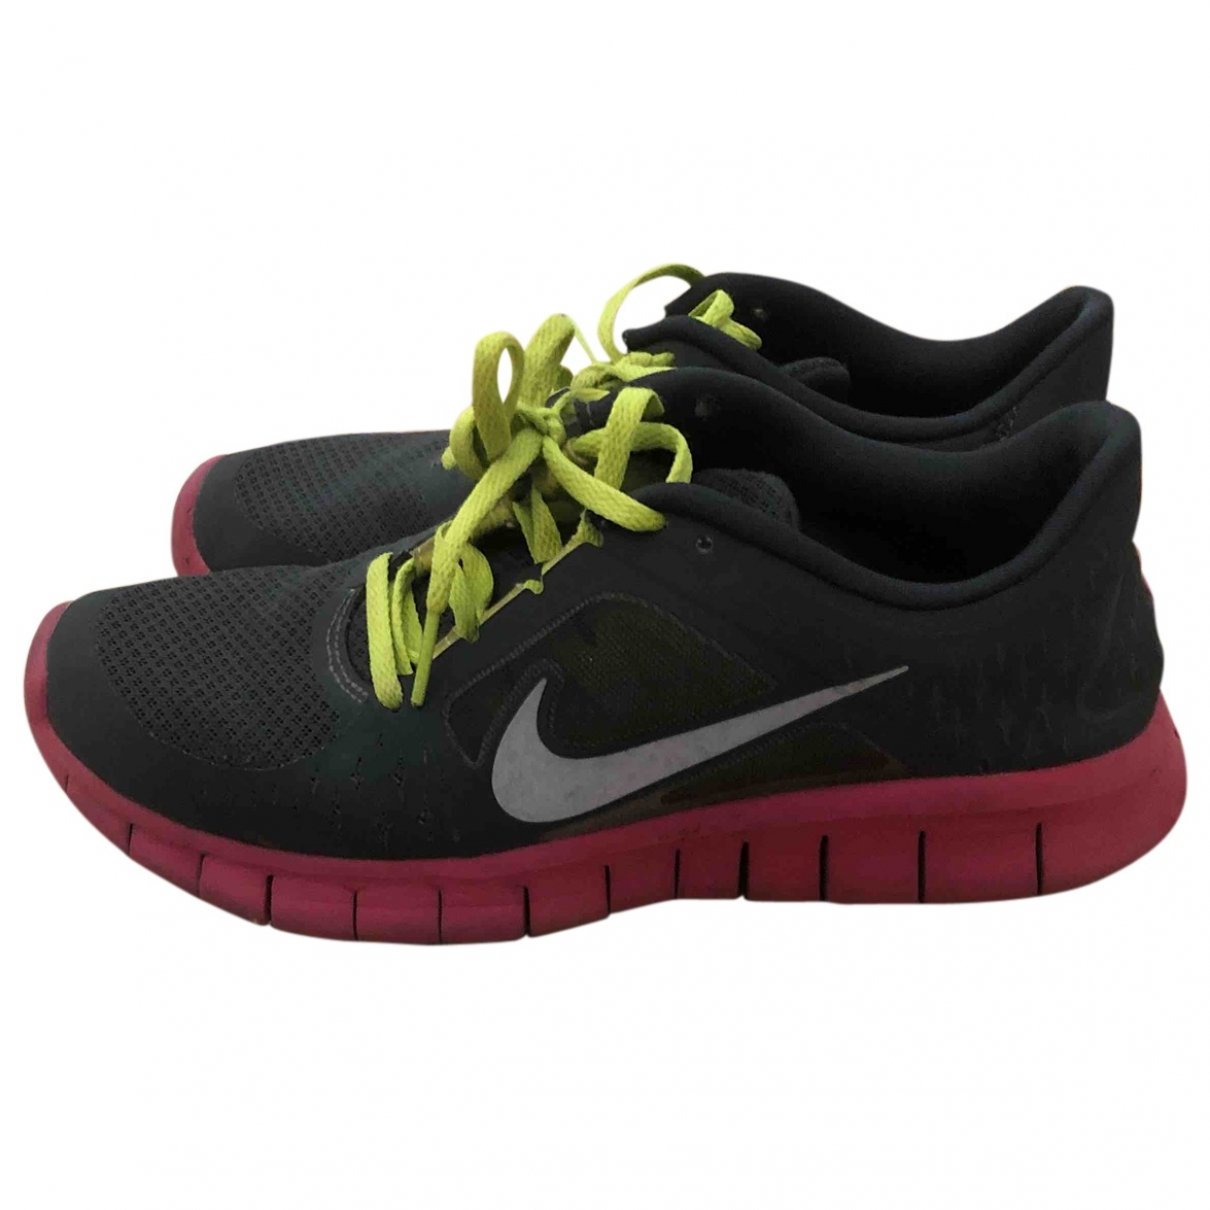 Nike - Baskets Free Run pour femme en toile - gris